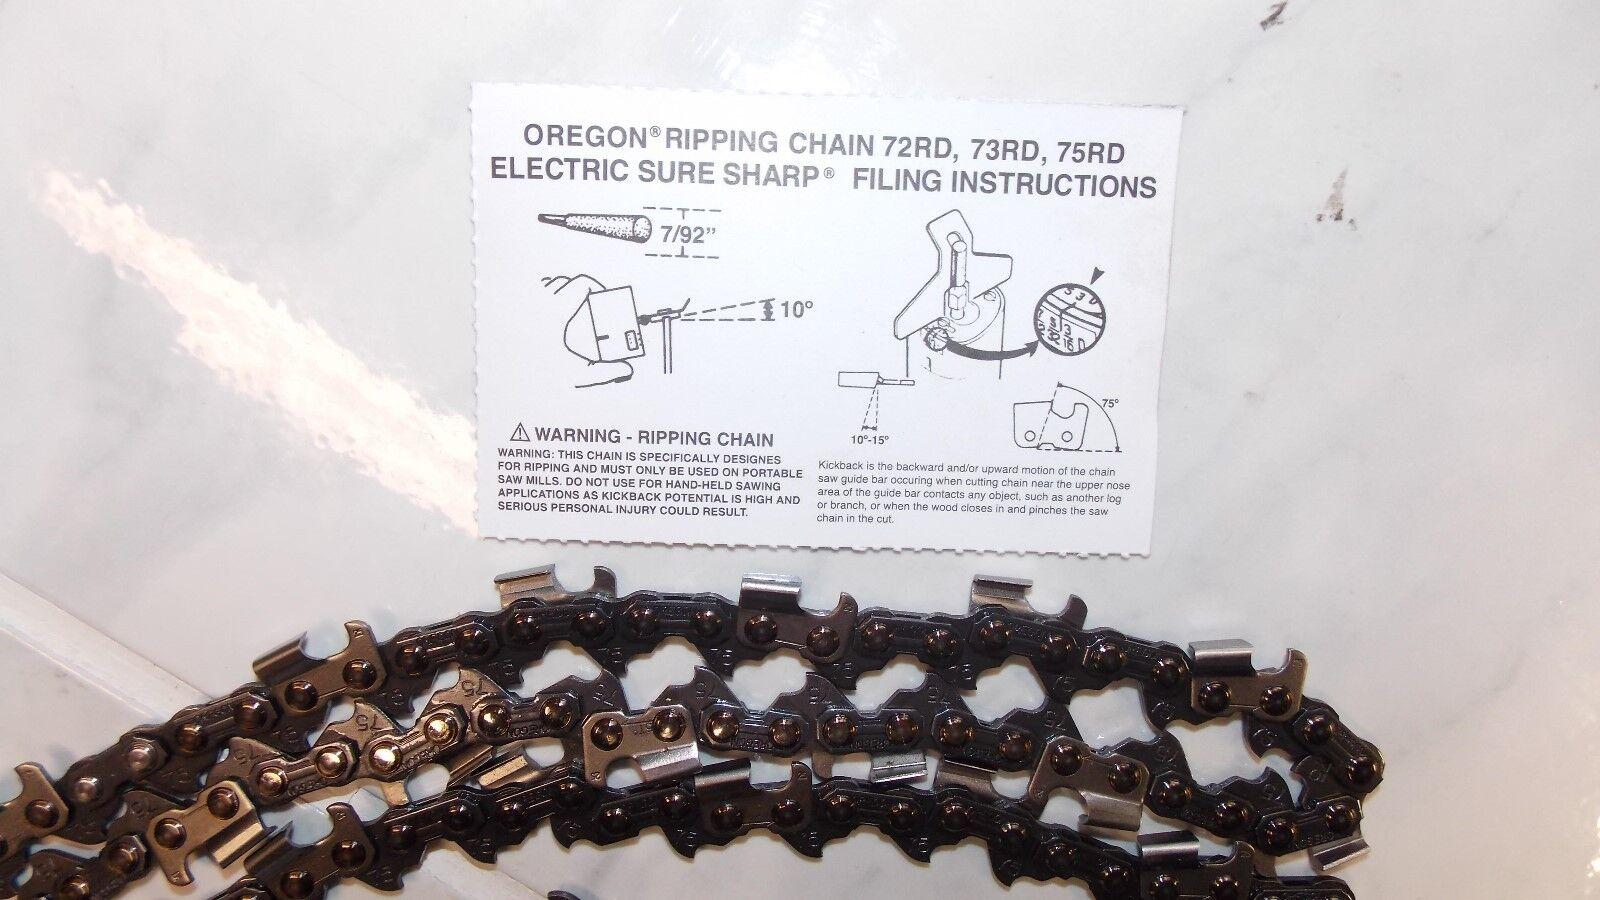 1 cadena de Oregon 75RD092G ripeo Motosierra 28  3 8 .063 92 DL Rip fresado de Sierra